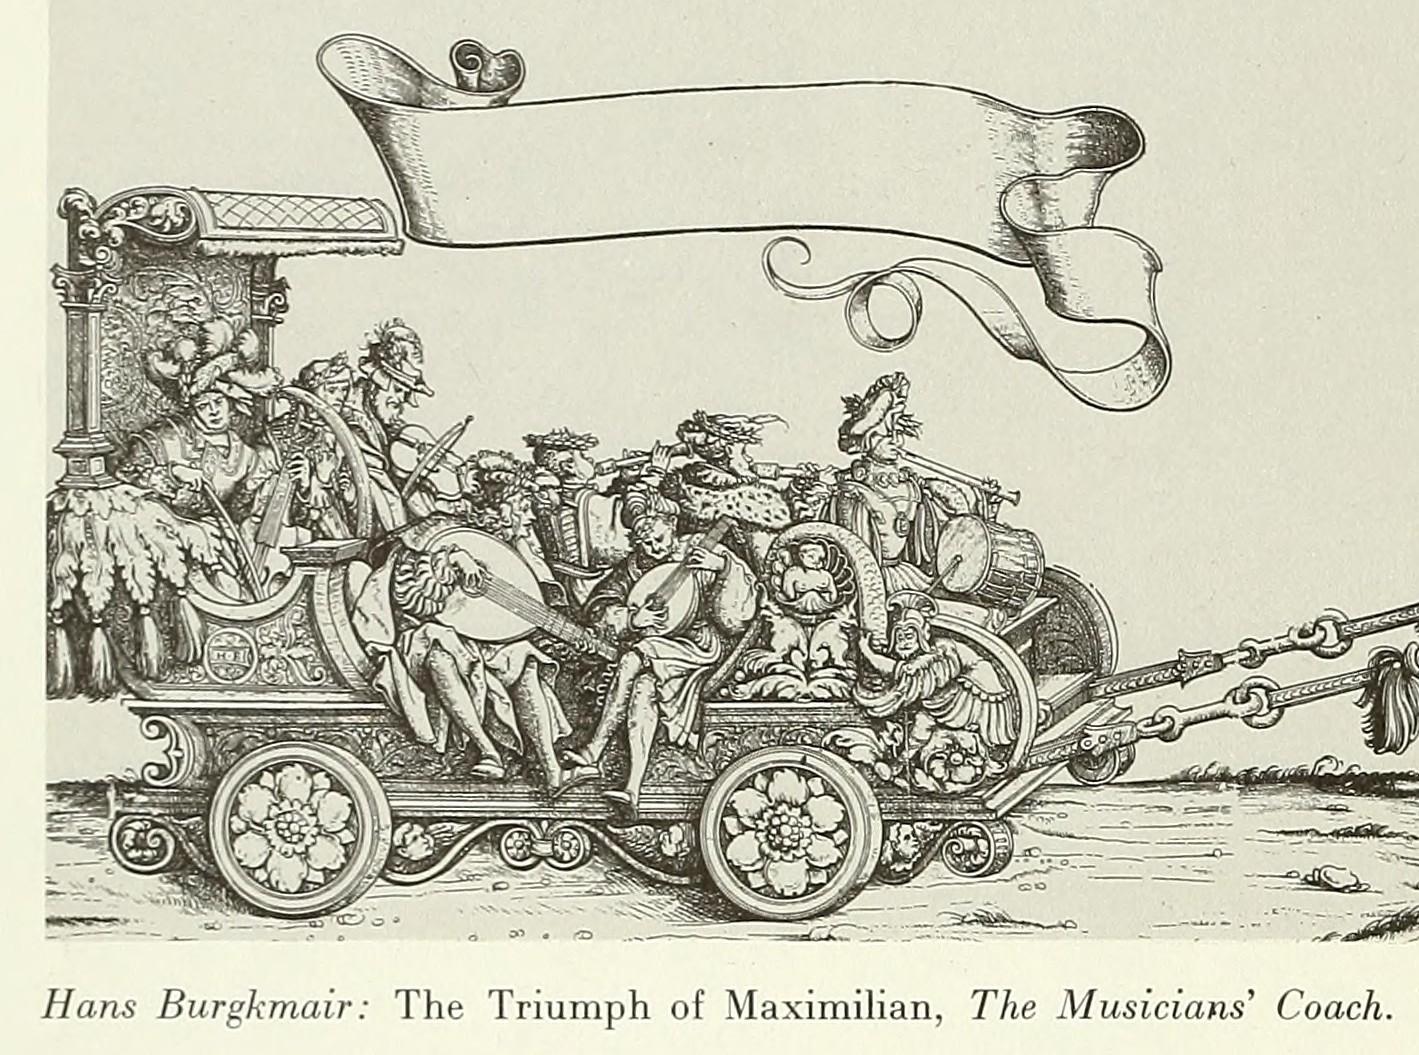 Hans Burgkmair : The Triumph of Maximilian